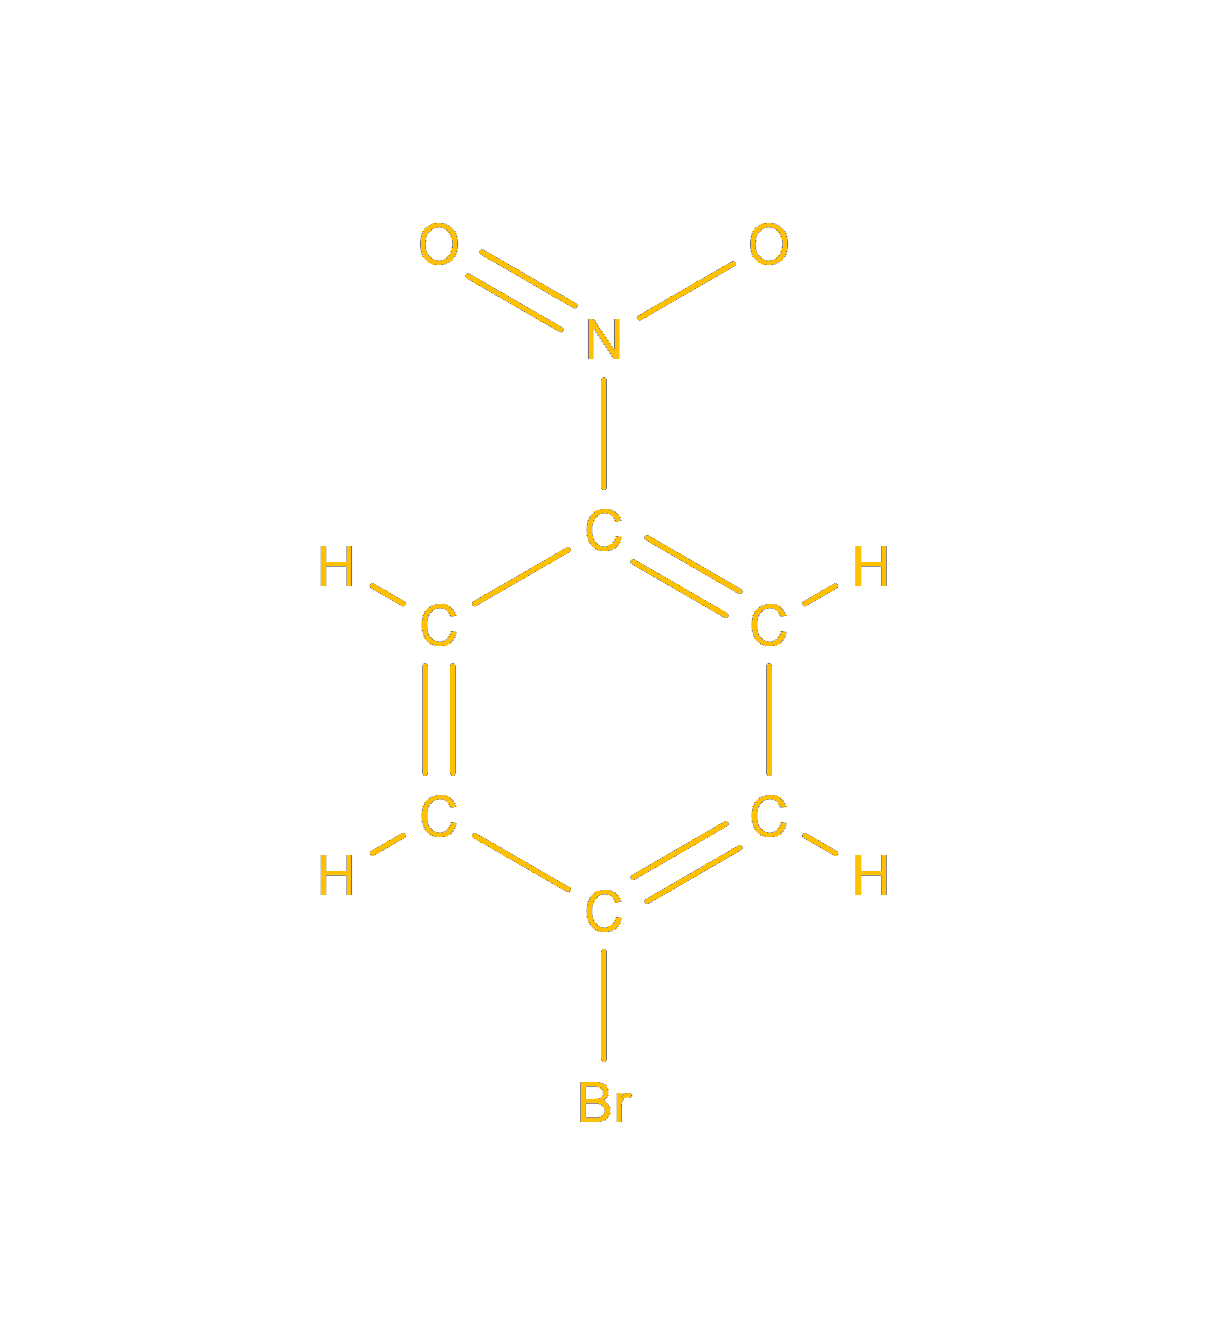 1-bromo-4-nitrobenzene